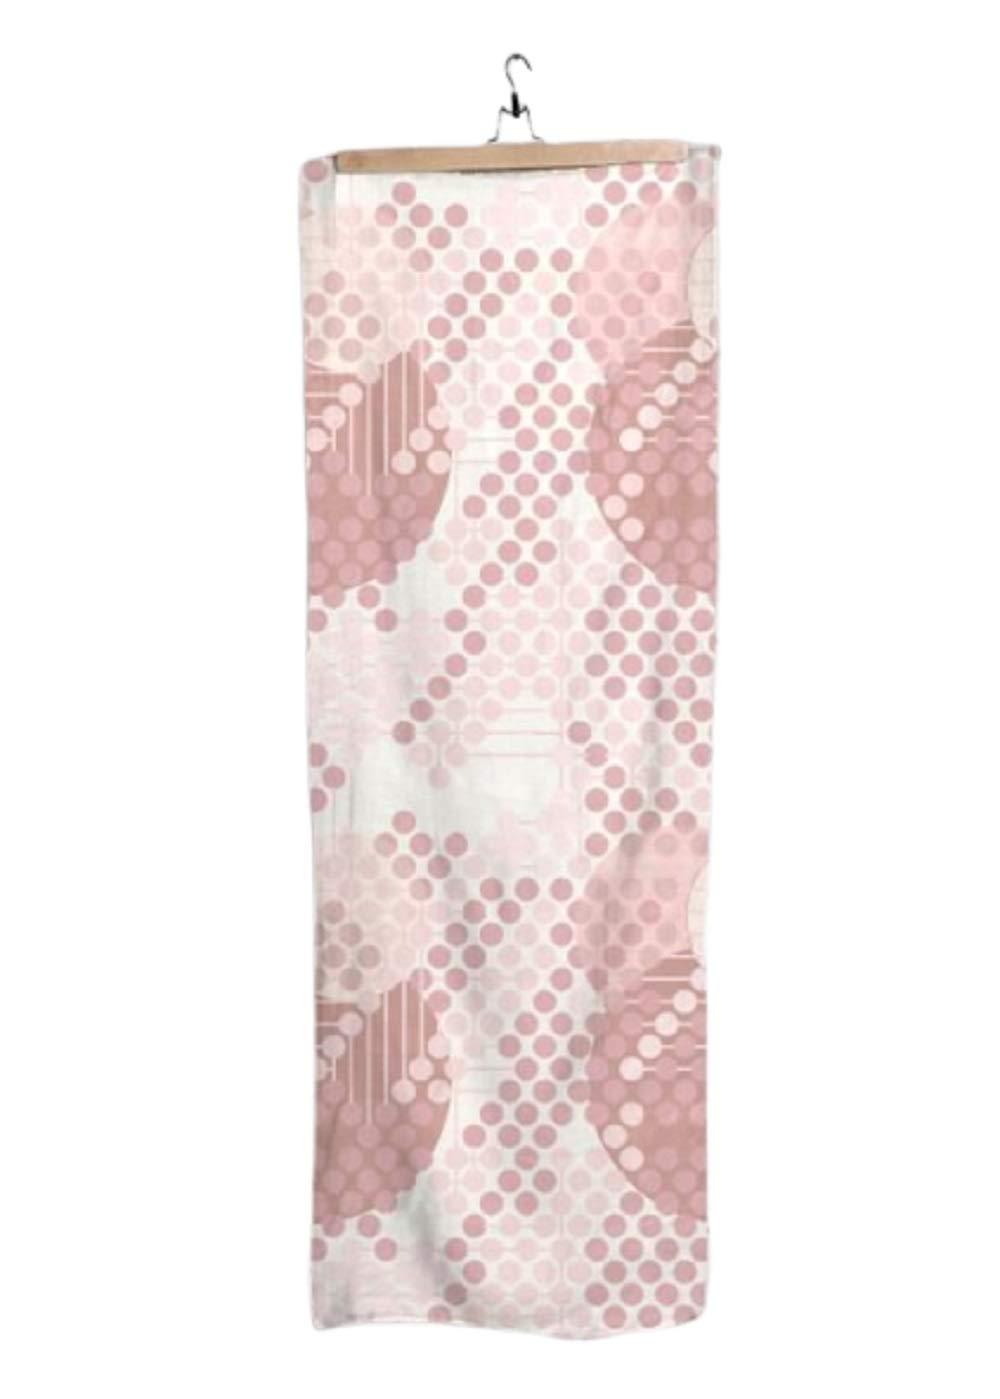 VIDA Rose Modal Scarf (1955 Textile Design - 105) 28'' × 78'' | Original Artwork by Frank Lloyd Wright